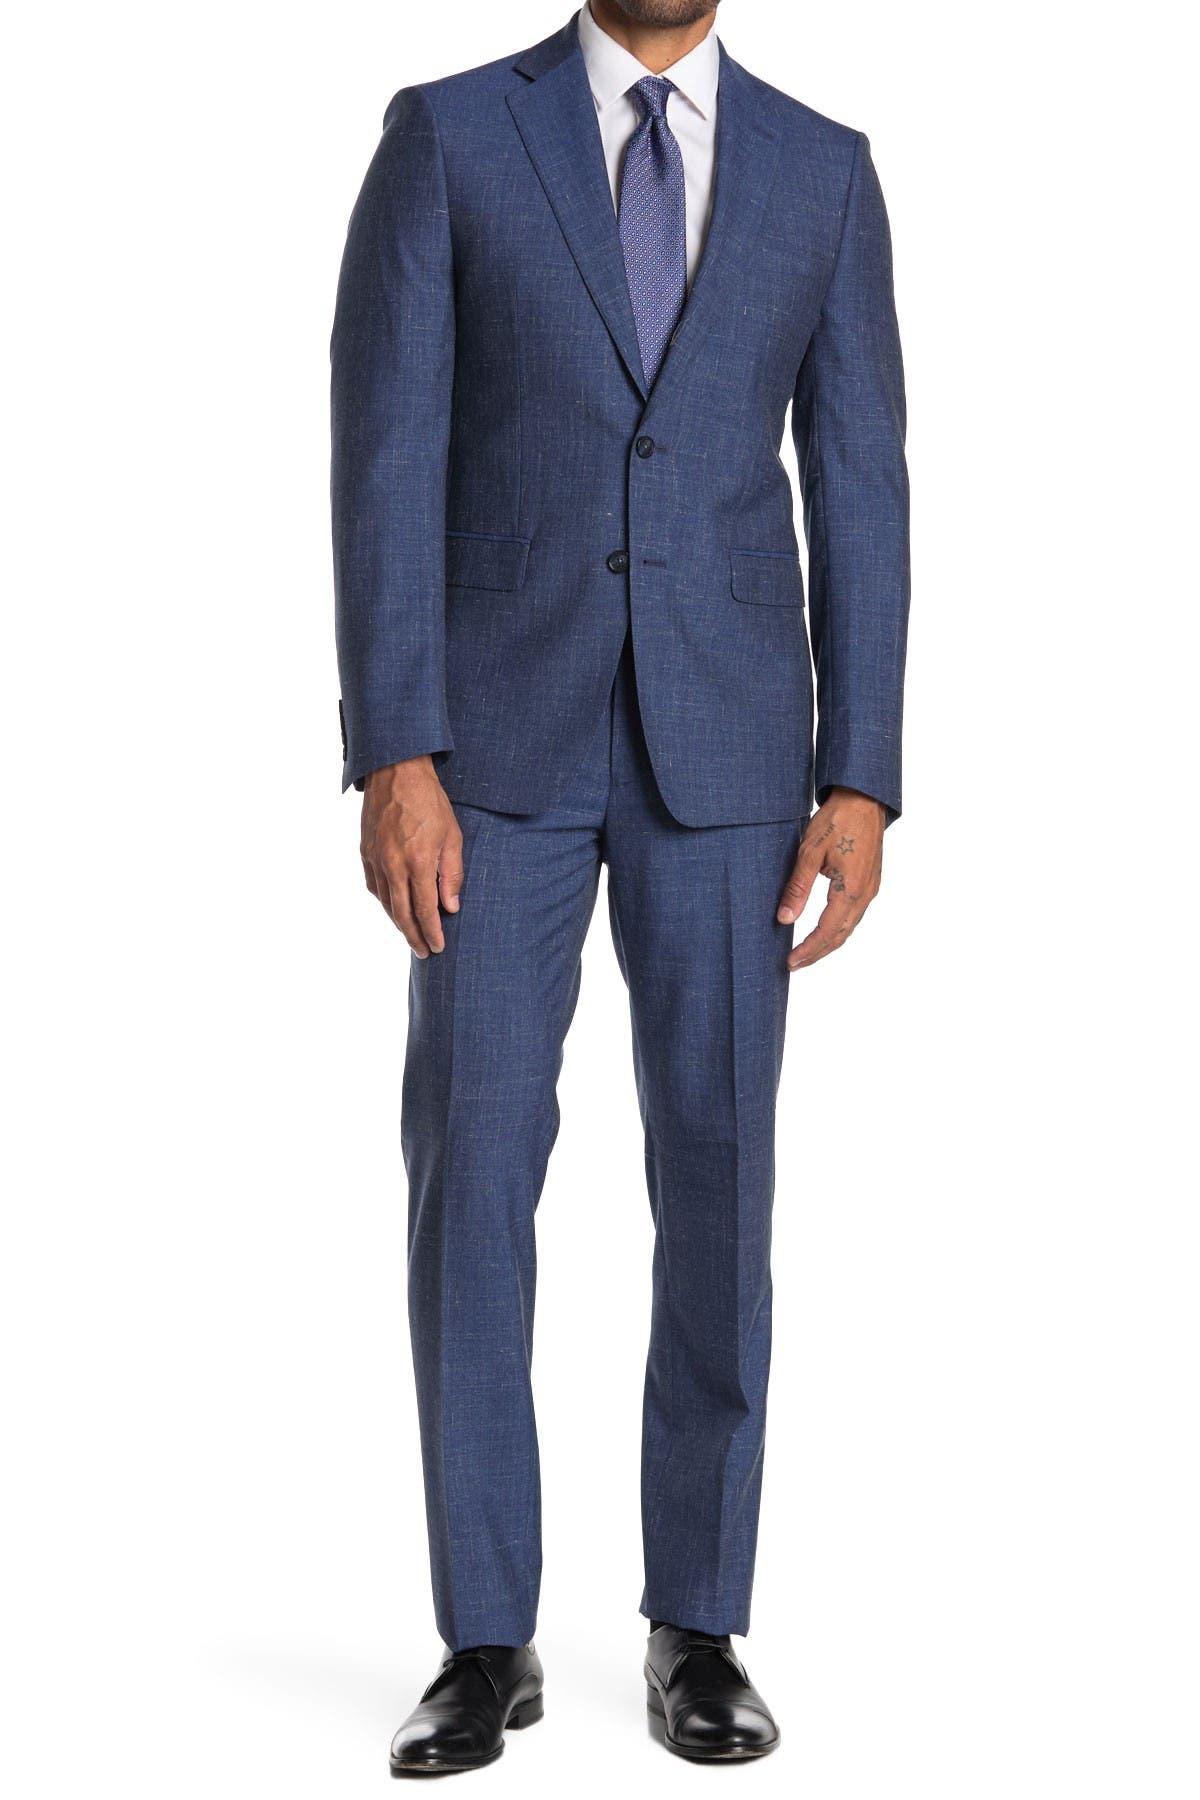 Image of Calvin Klein Plain Bright Navy Slim Suit